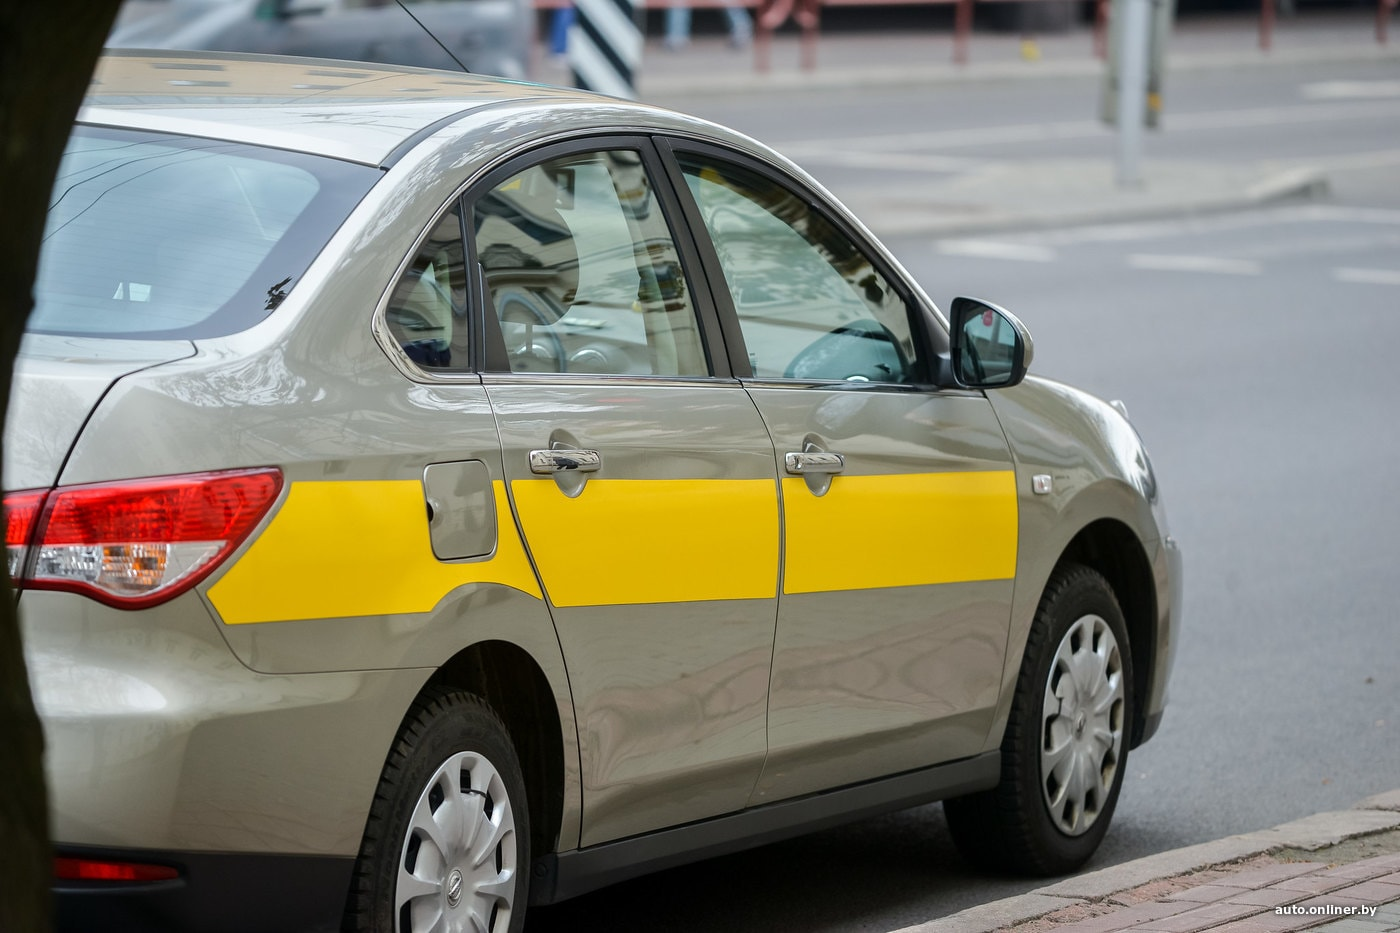 Рынок такси в Беларуси растет.